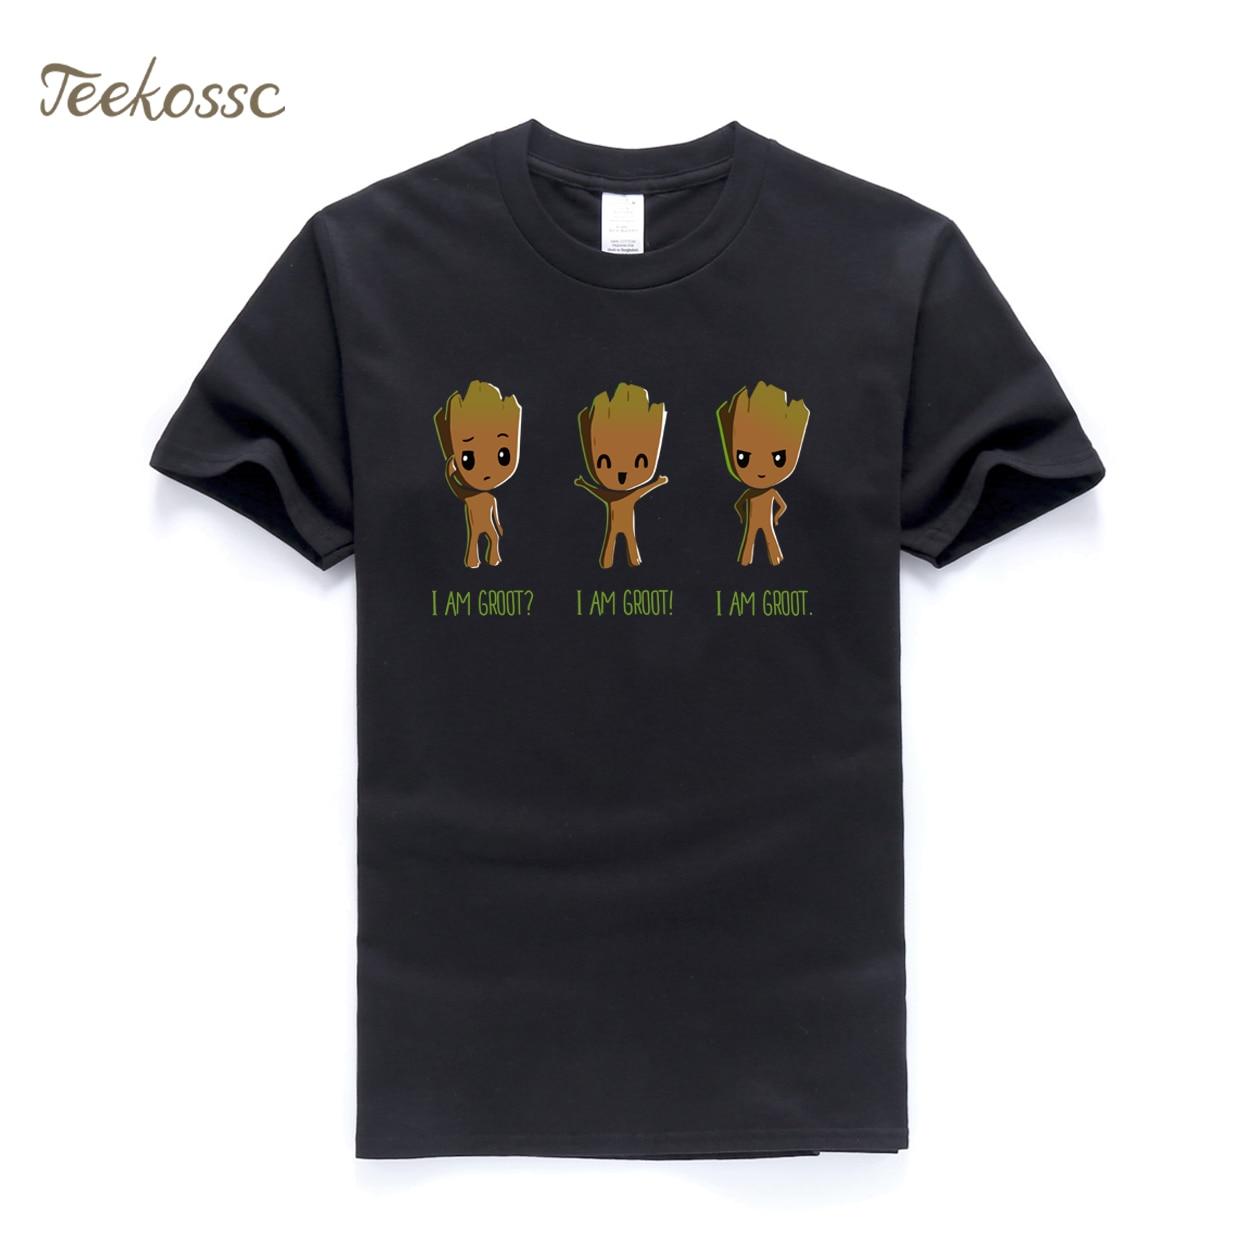 I AM GROOT T Shirt Men Cool Funny T Shirts 2018 Summer Super Hero Tee White Black Print Brand Clothing Slim fit Groot T-Shirt